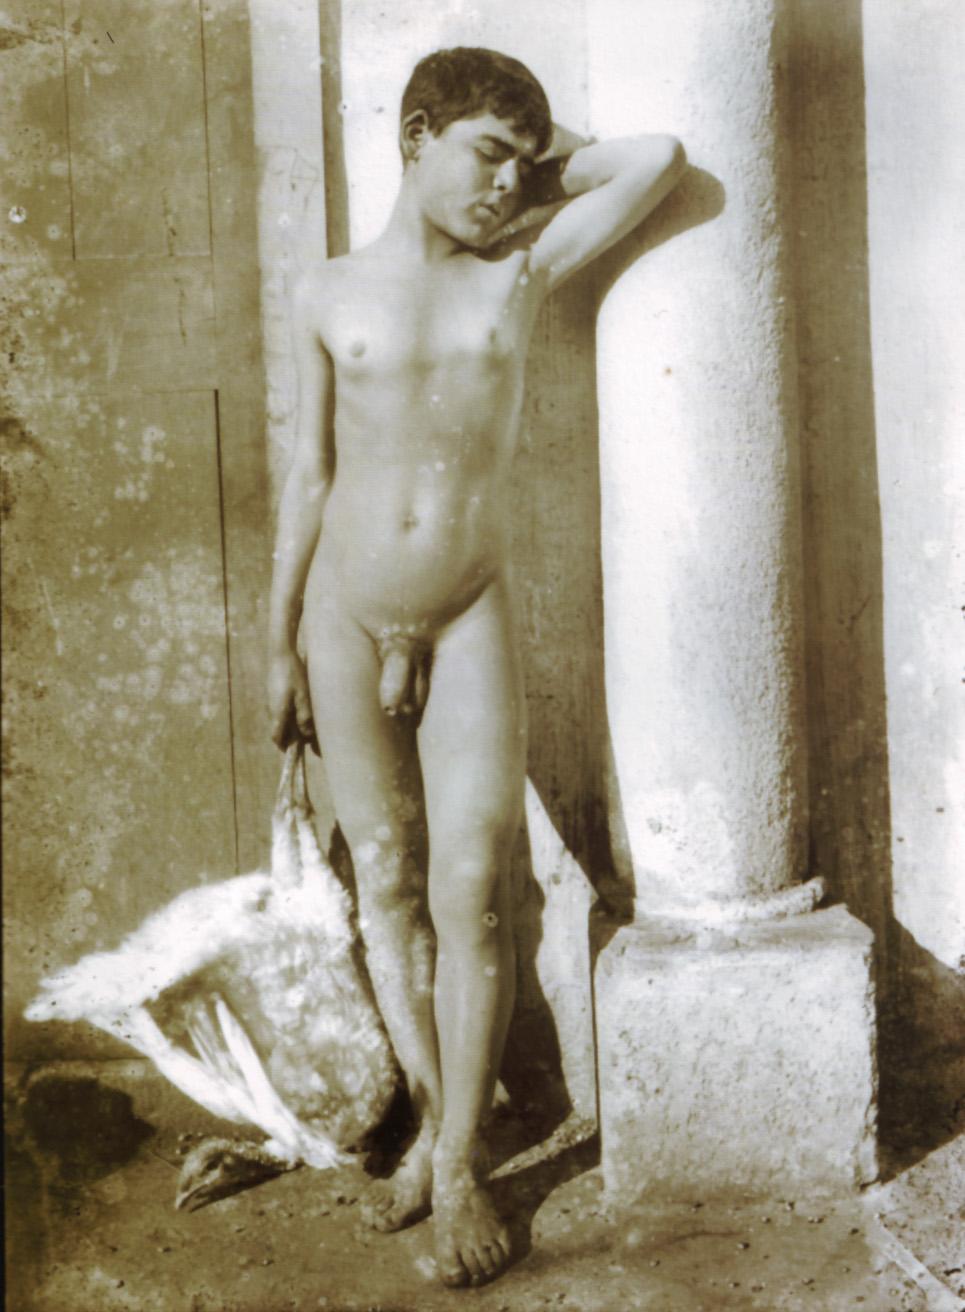 free cumshot pics galleries sex orgy